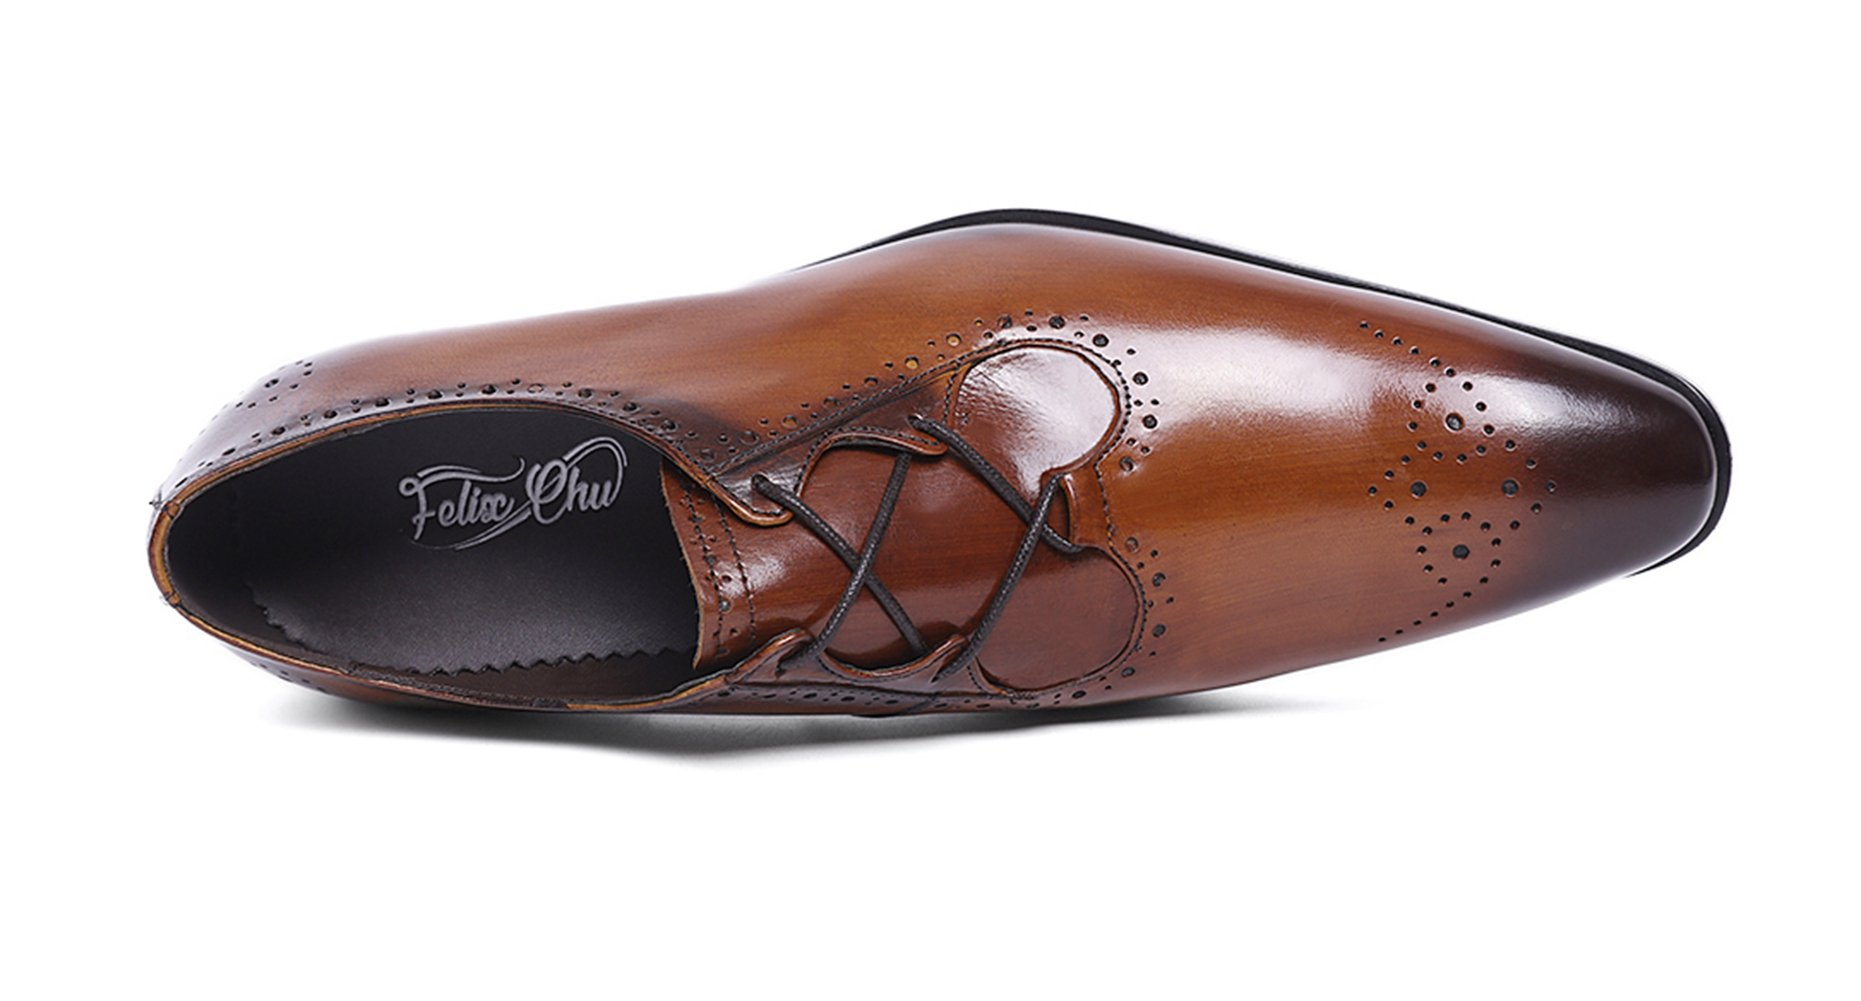 Felix Chu Men's Italian Designer Luxury Perfect Genuine Calf Leather shoes, Brown, 9 D(M) US by Felix Chu (Image #3)